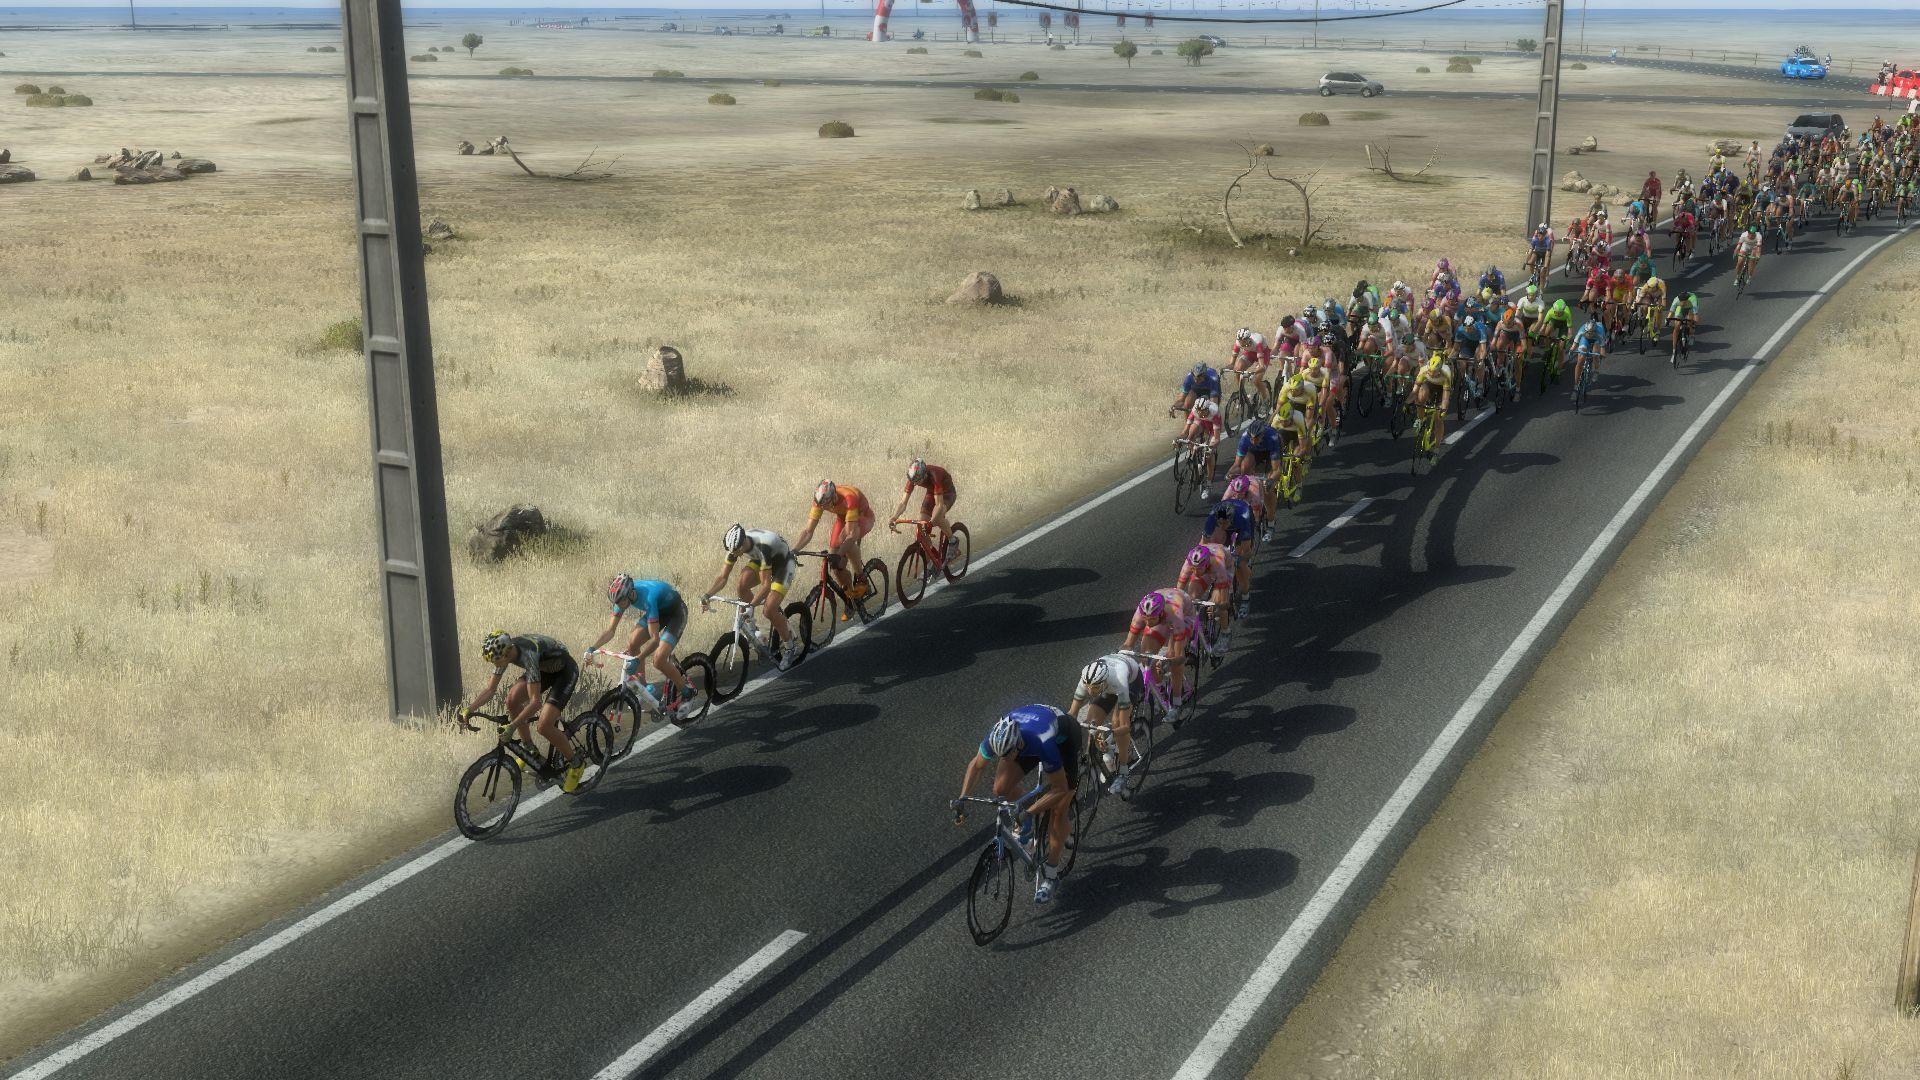 pcmdaily.com/images/mg/2019/Races/PT/Qatar/mg19_qat_s04_12.jpg